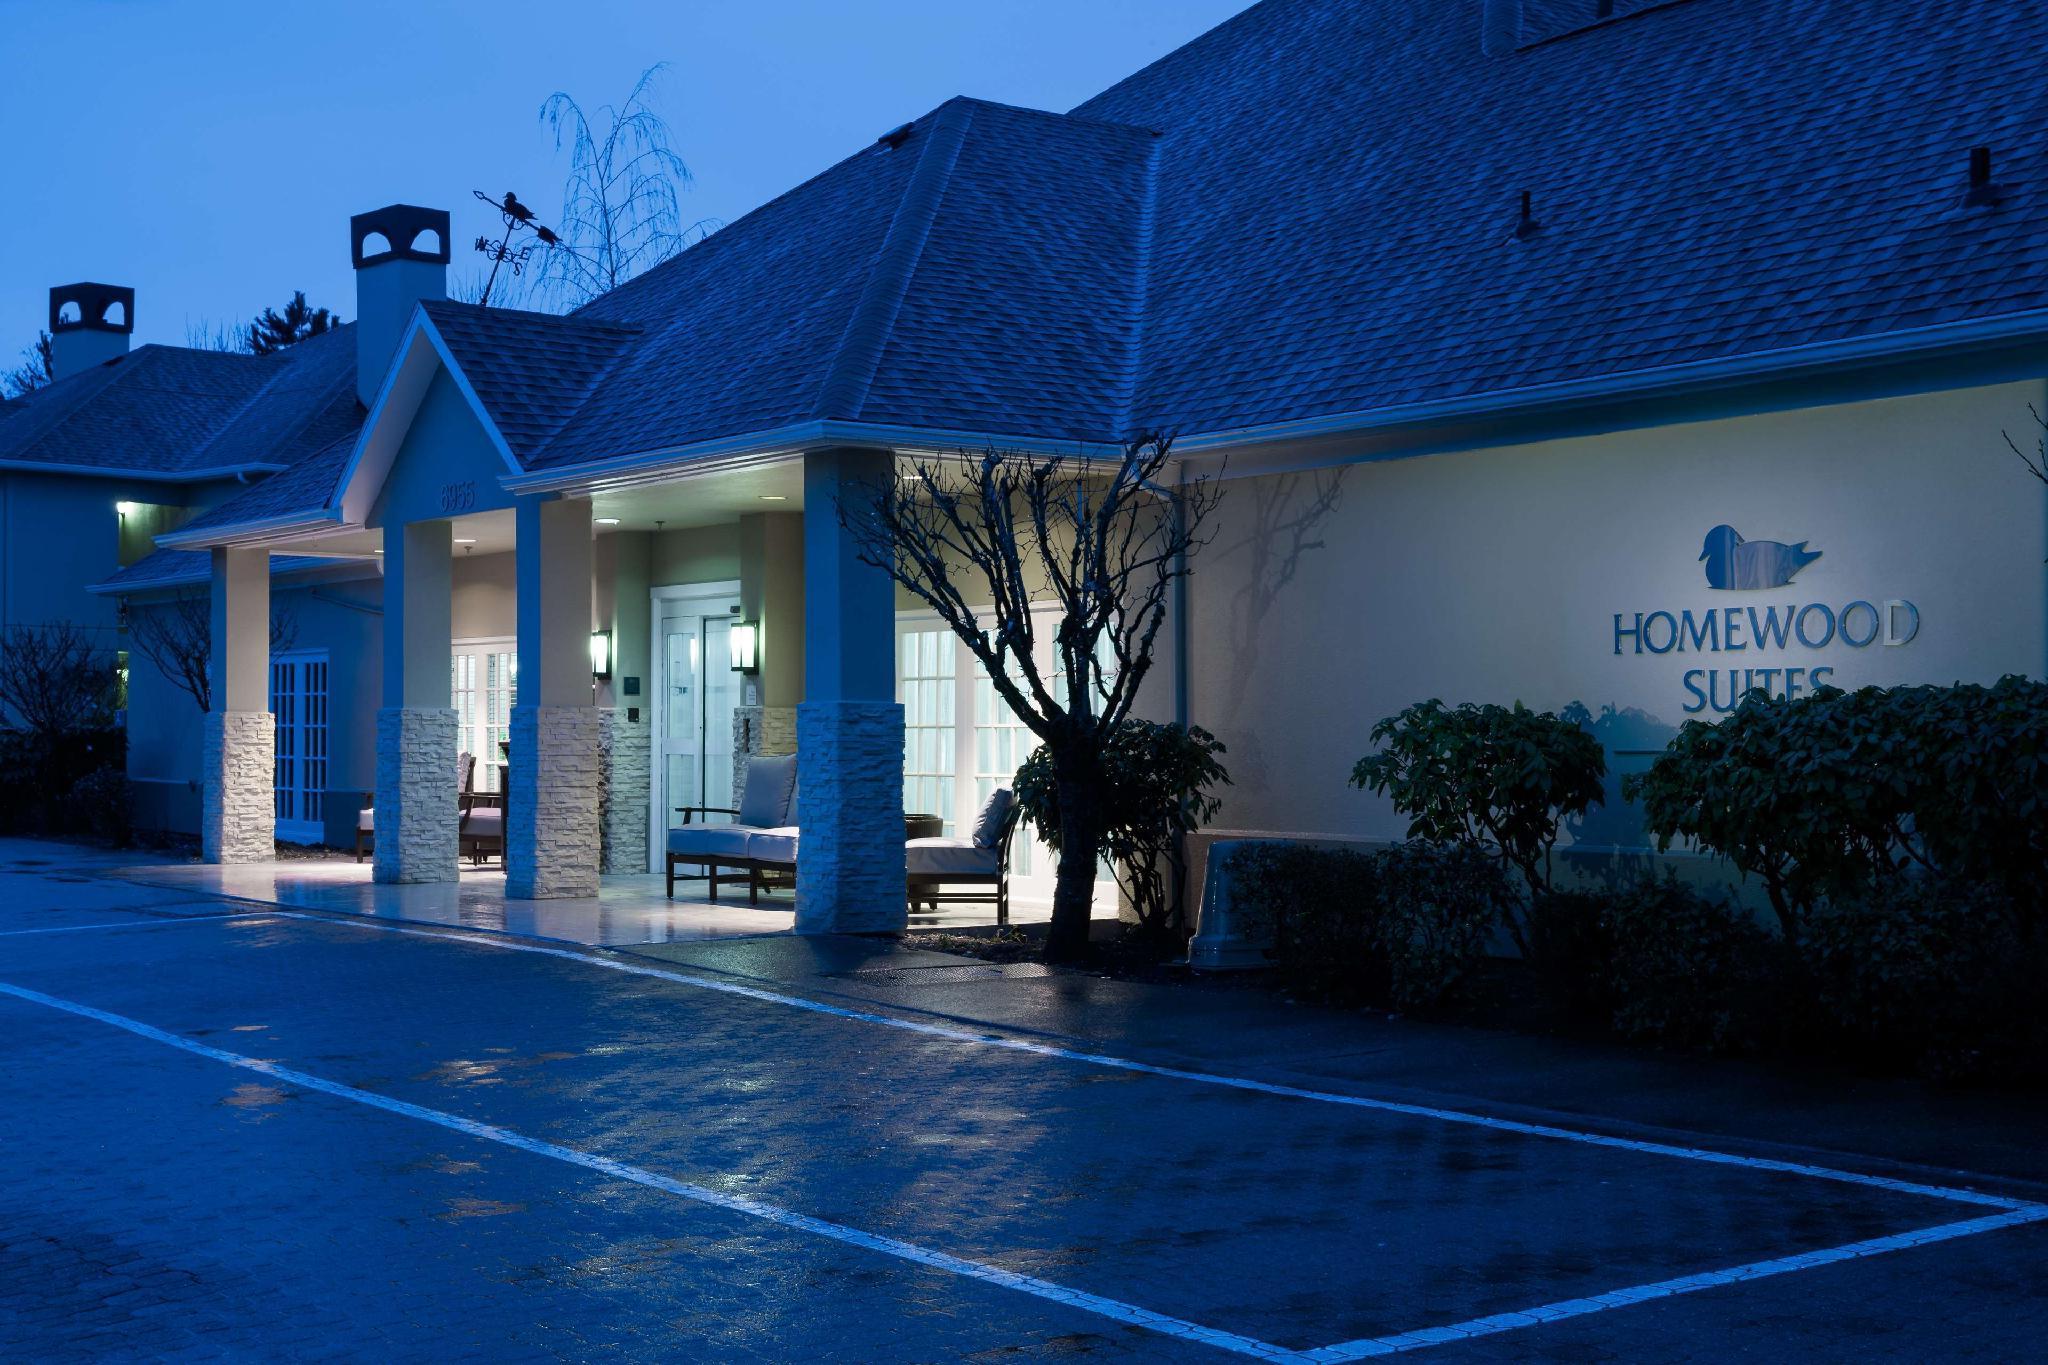 Homewood Suites By Hilton SeattleTacoma Airport Tukwila